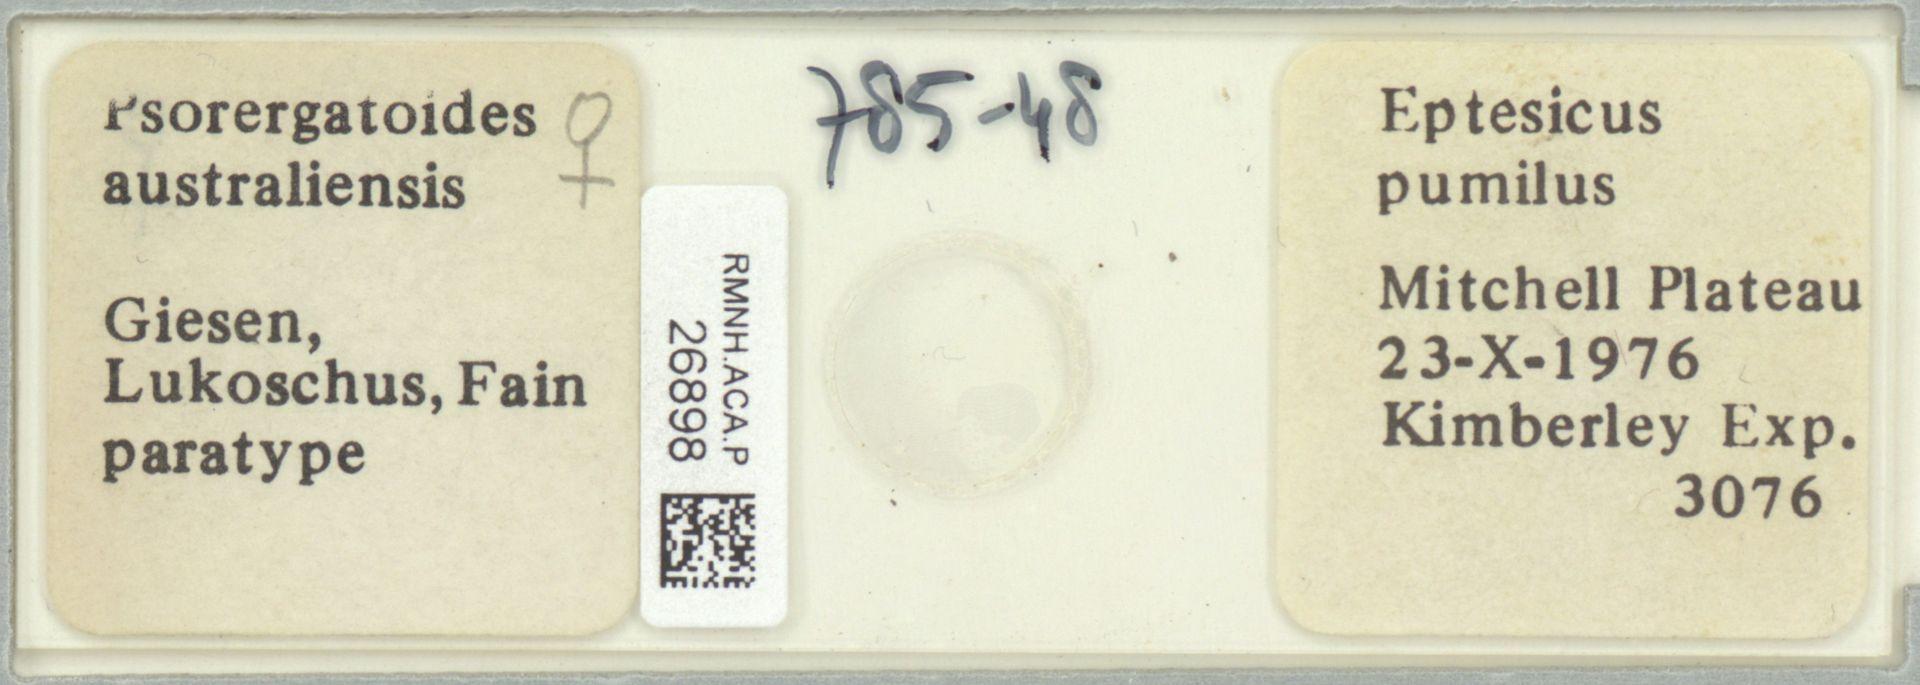 RMNH.ACA.P.26898   Psorergatoides australiensis Giesen, Lukoschus, Fain